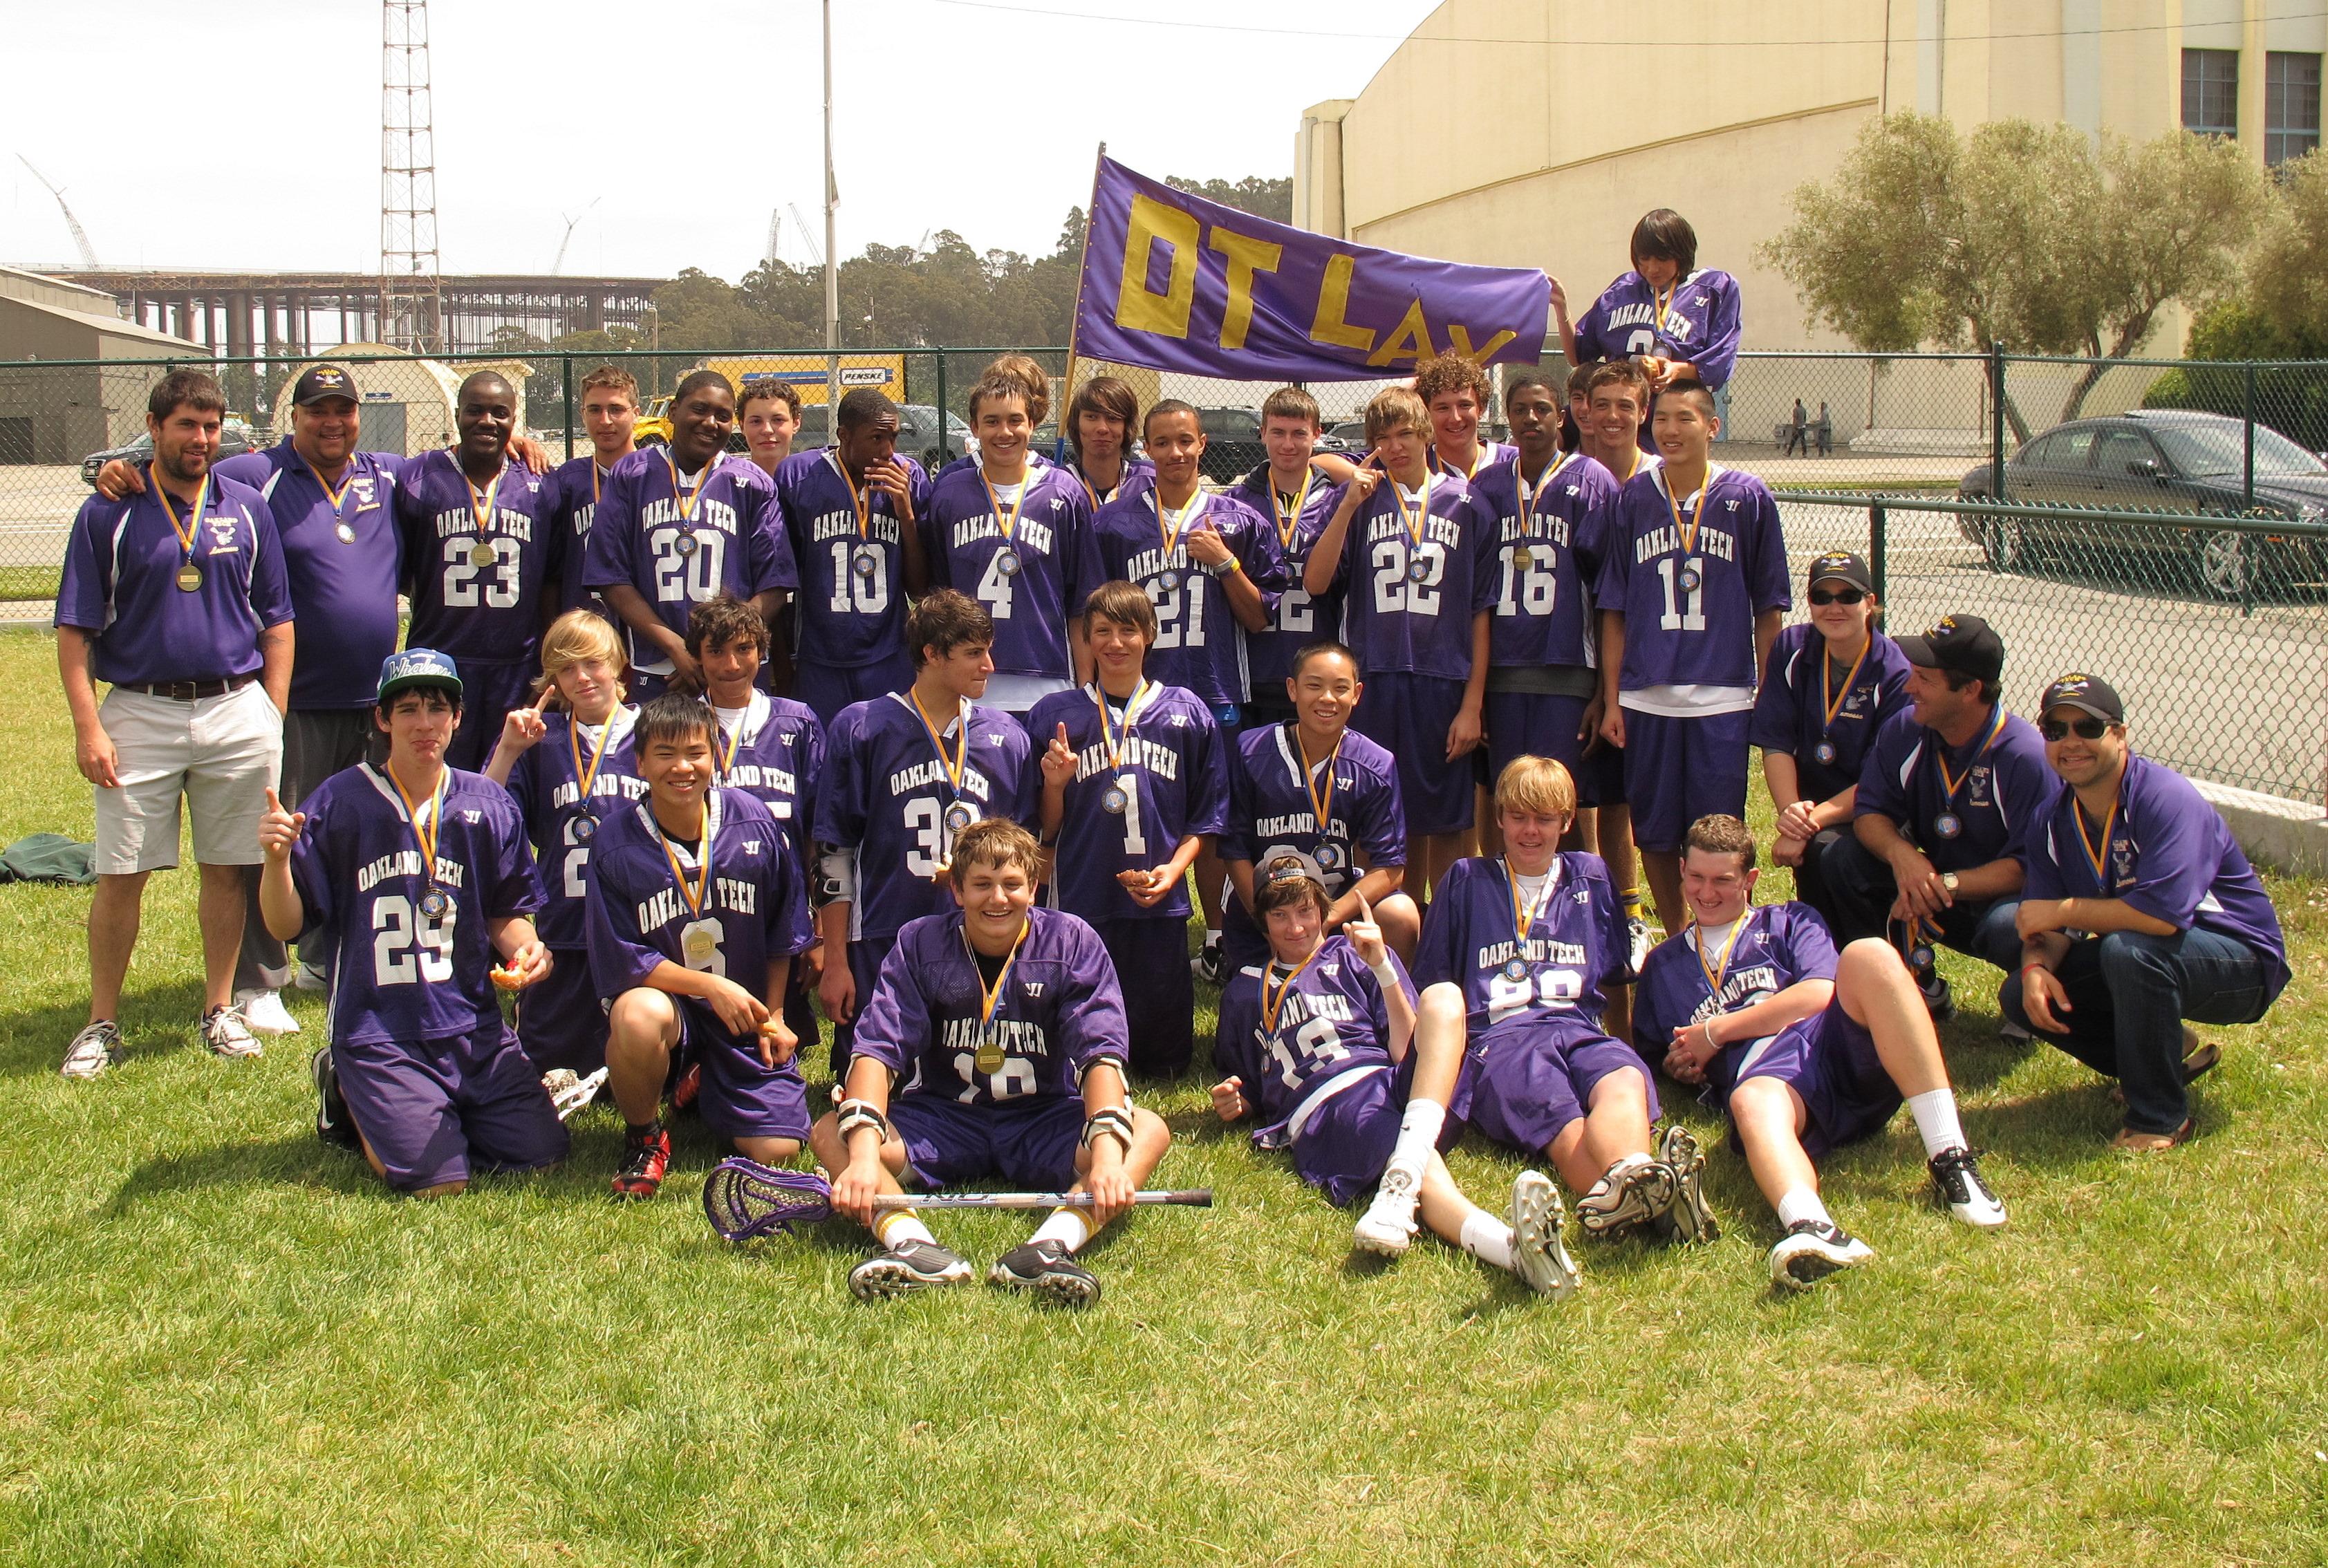 High school lacrosse players